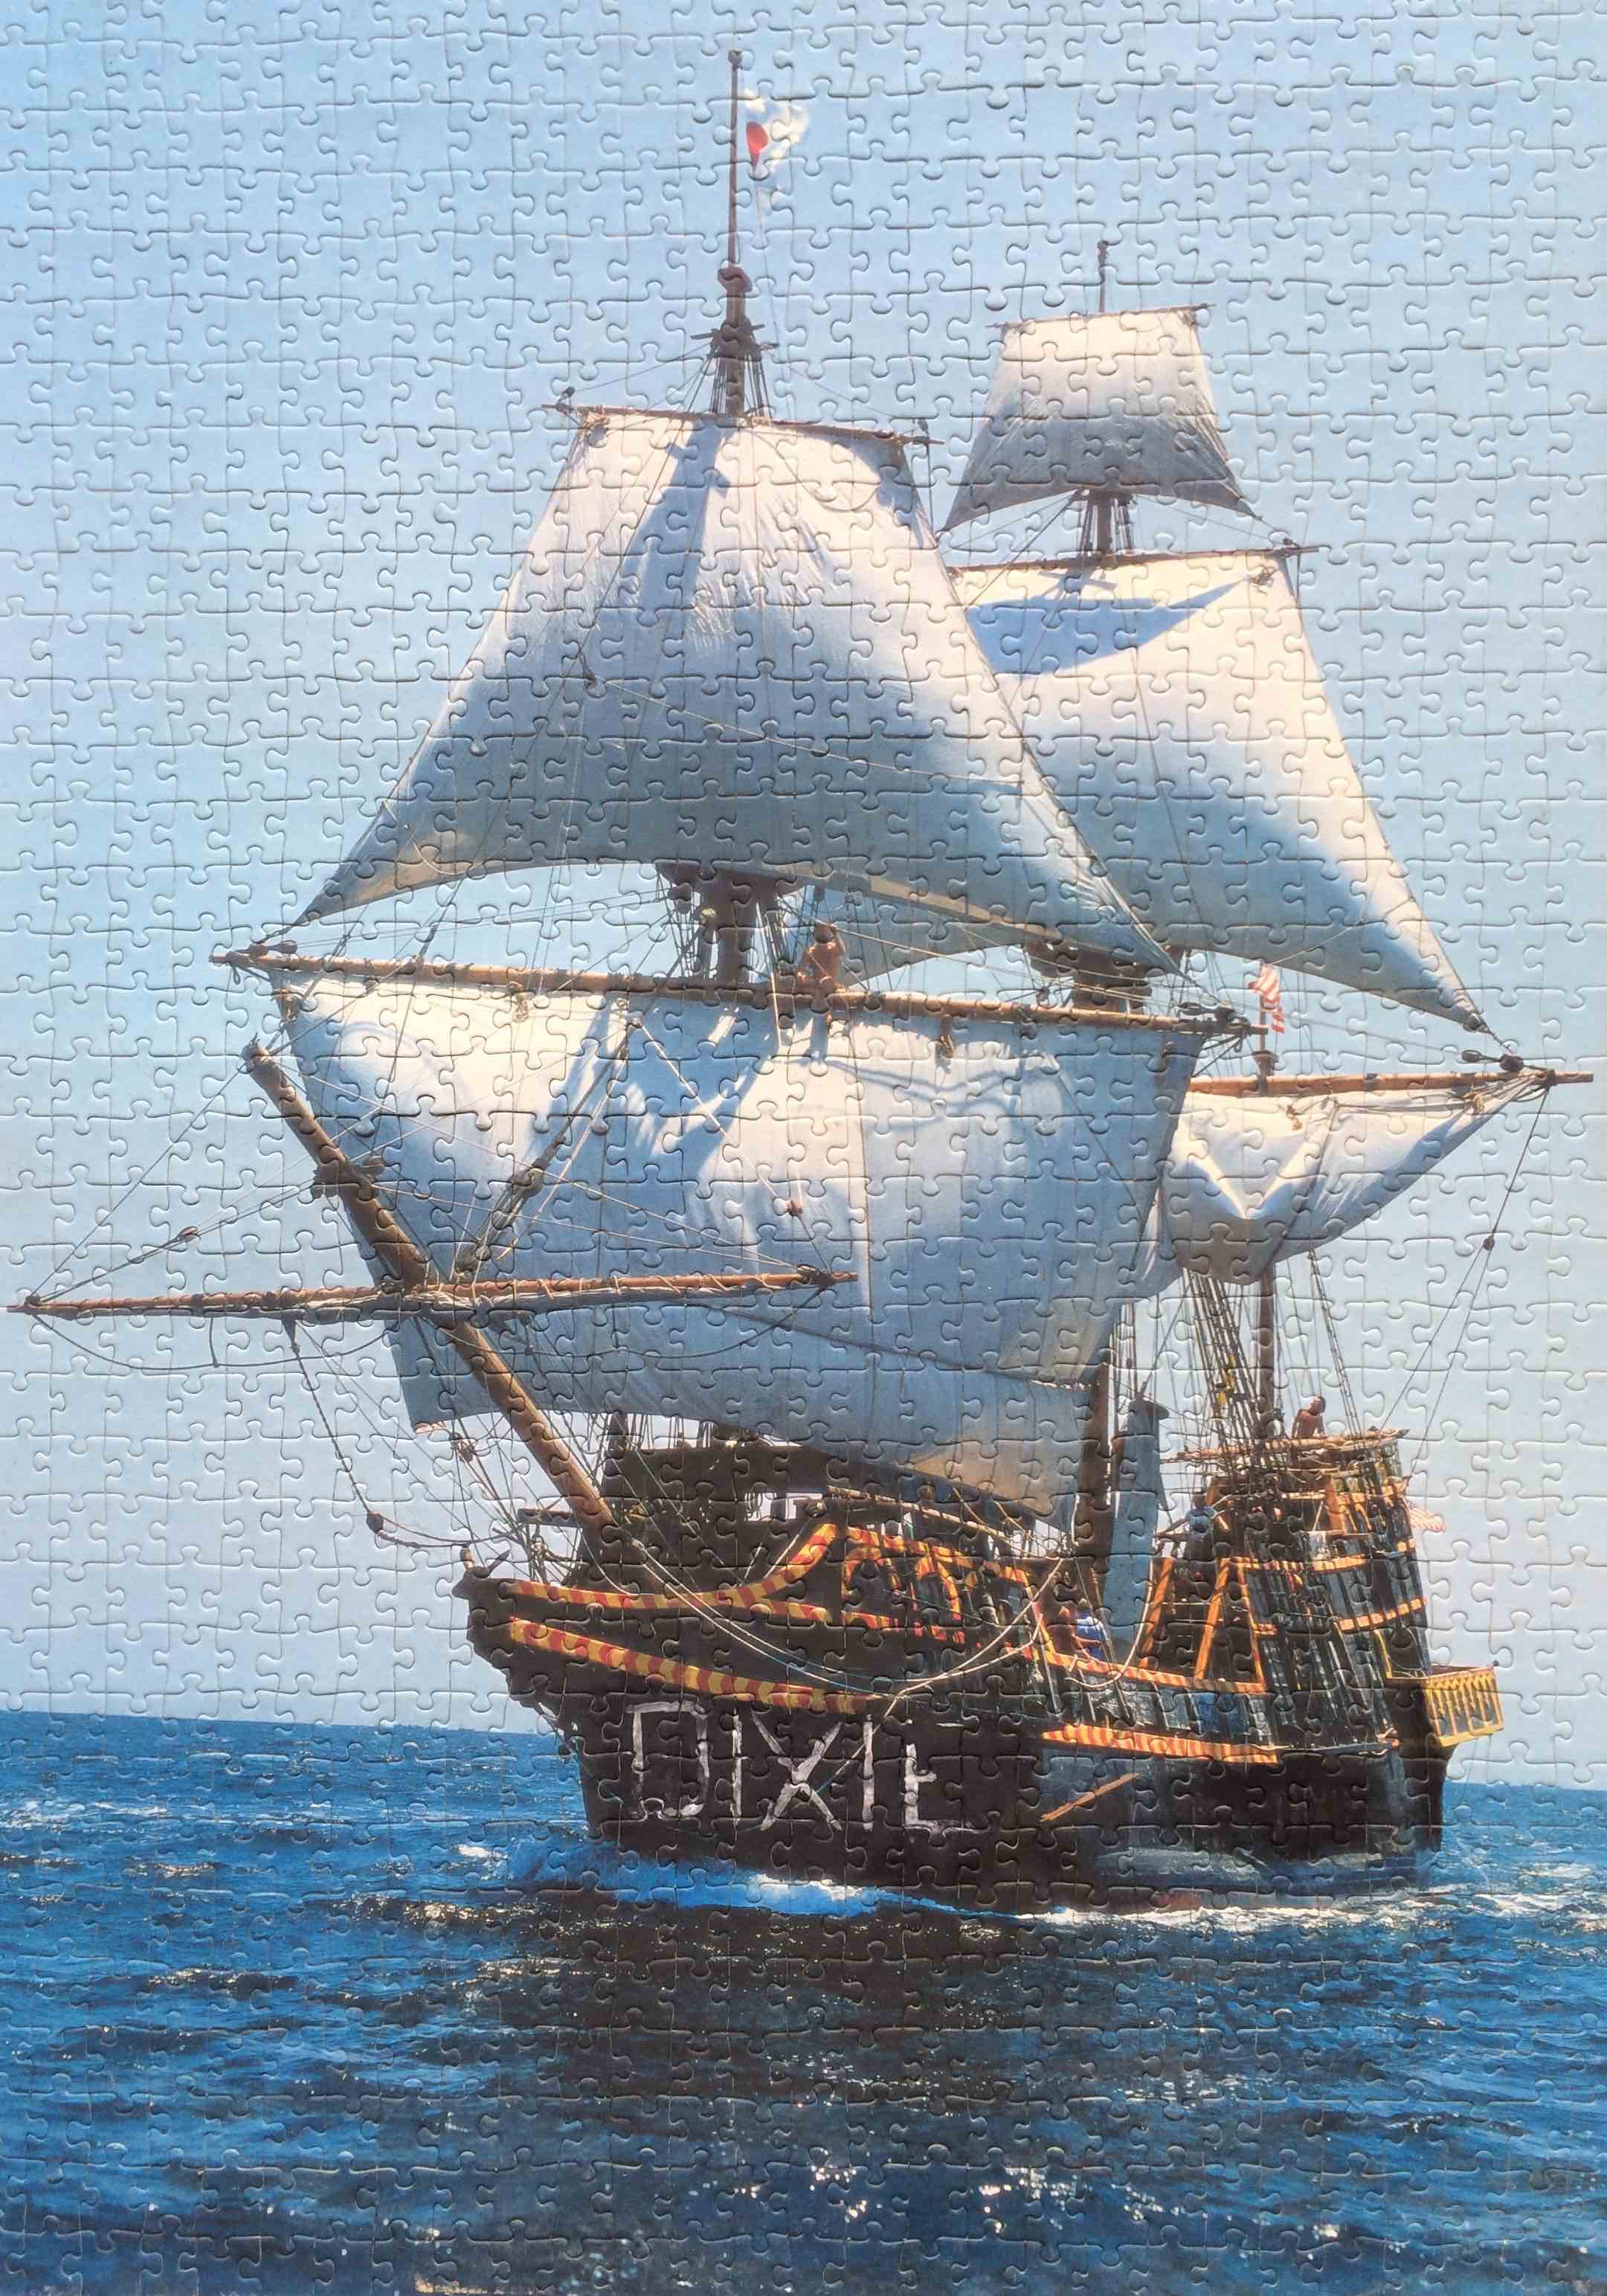 DIXIE   2011, acrylic on found jigsaw puzzle panel; 70x50 cm   Copyright © Tennyson Woodbridge, 1963 to present